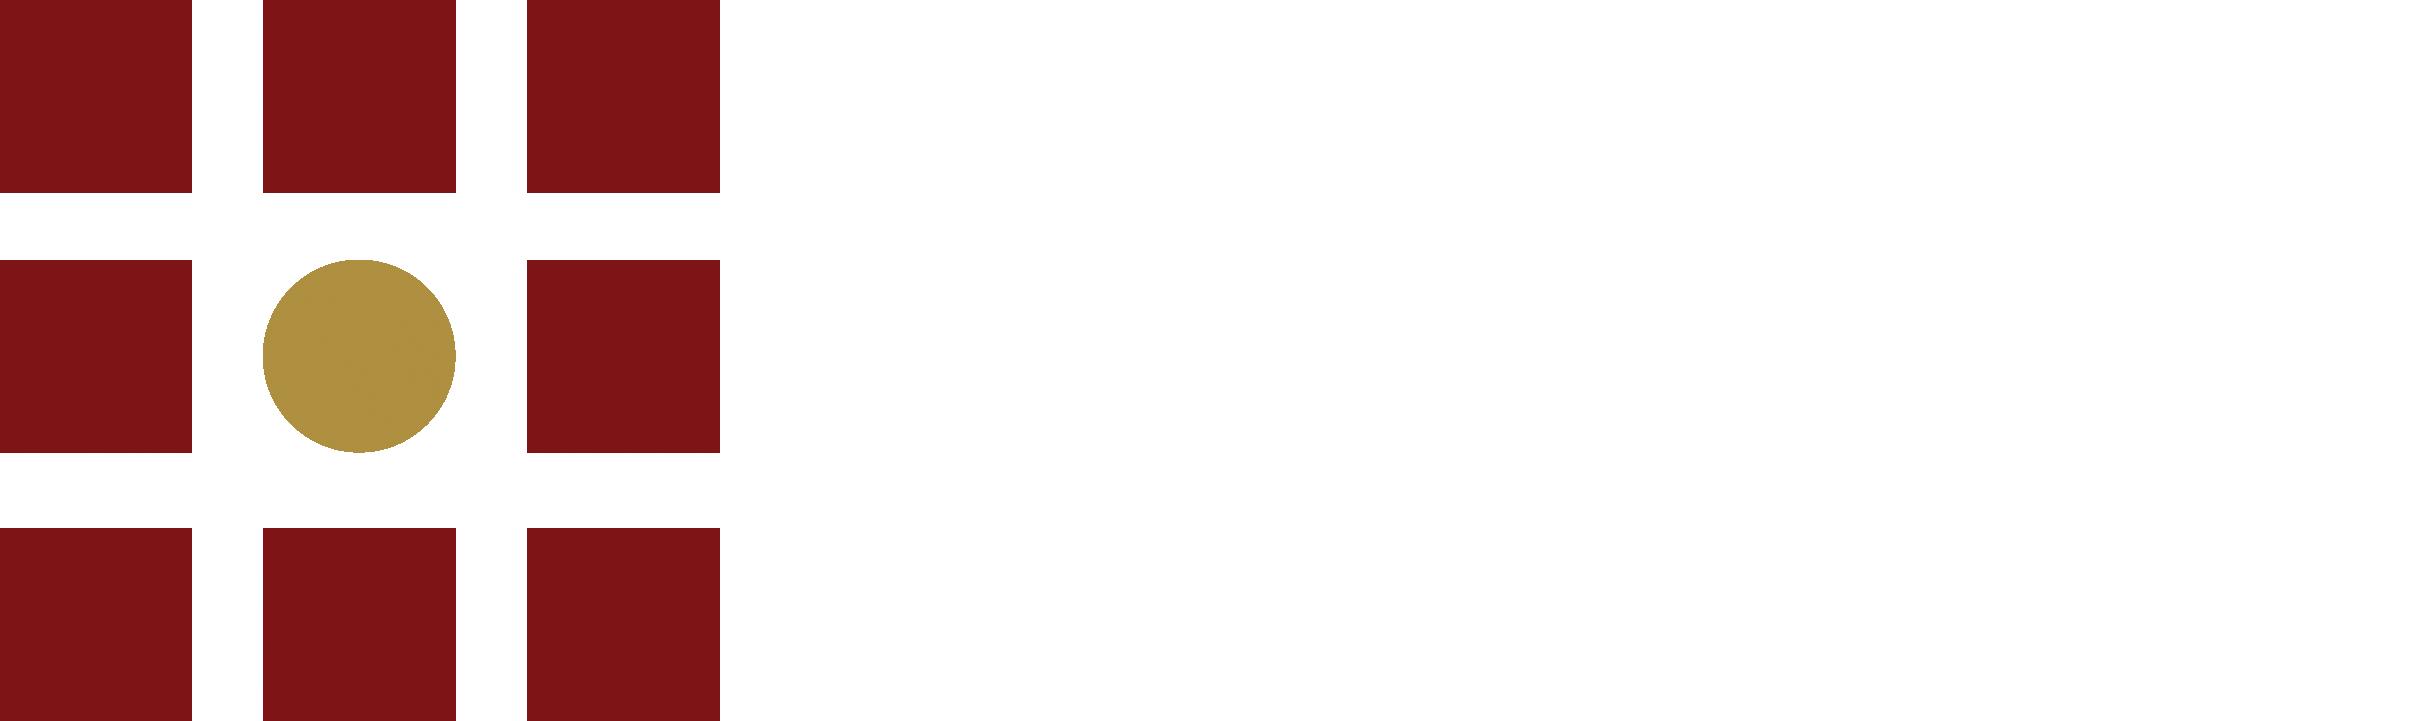 Redlands Community College Foundation